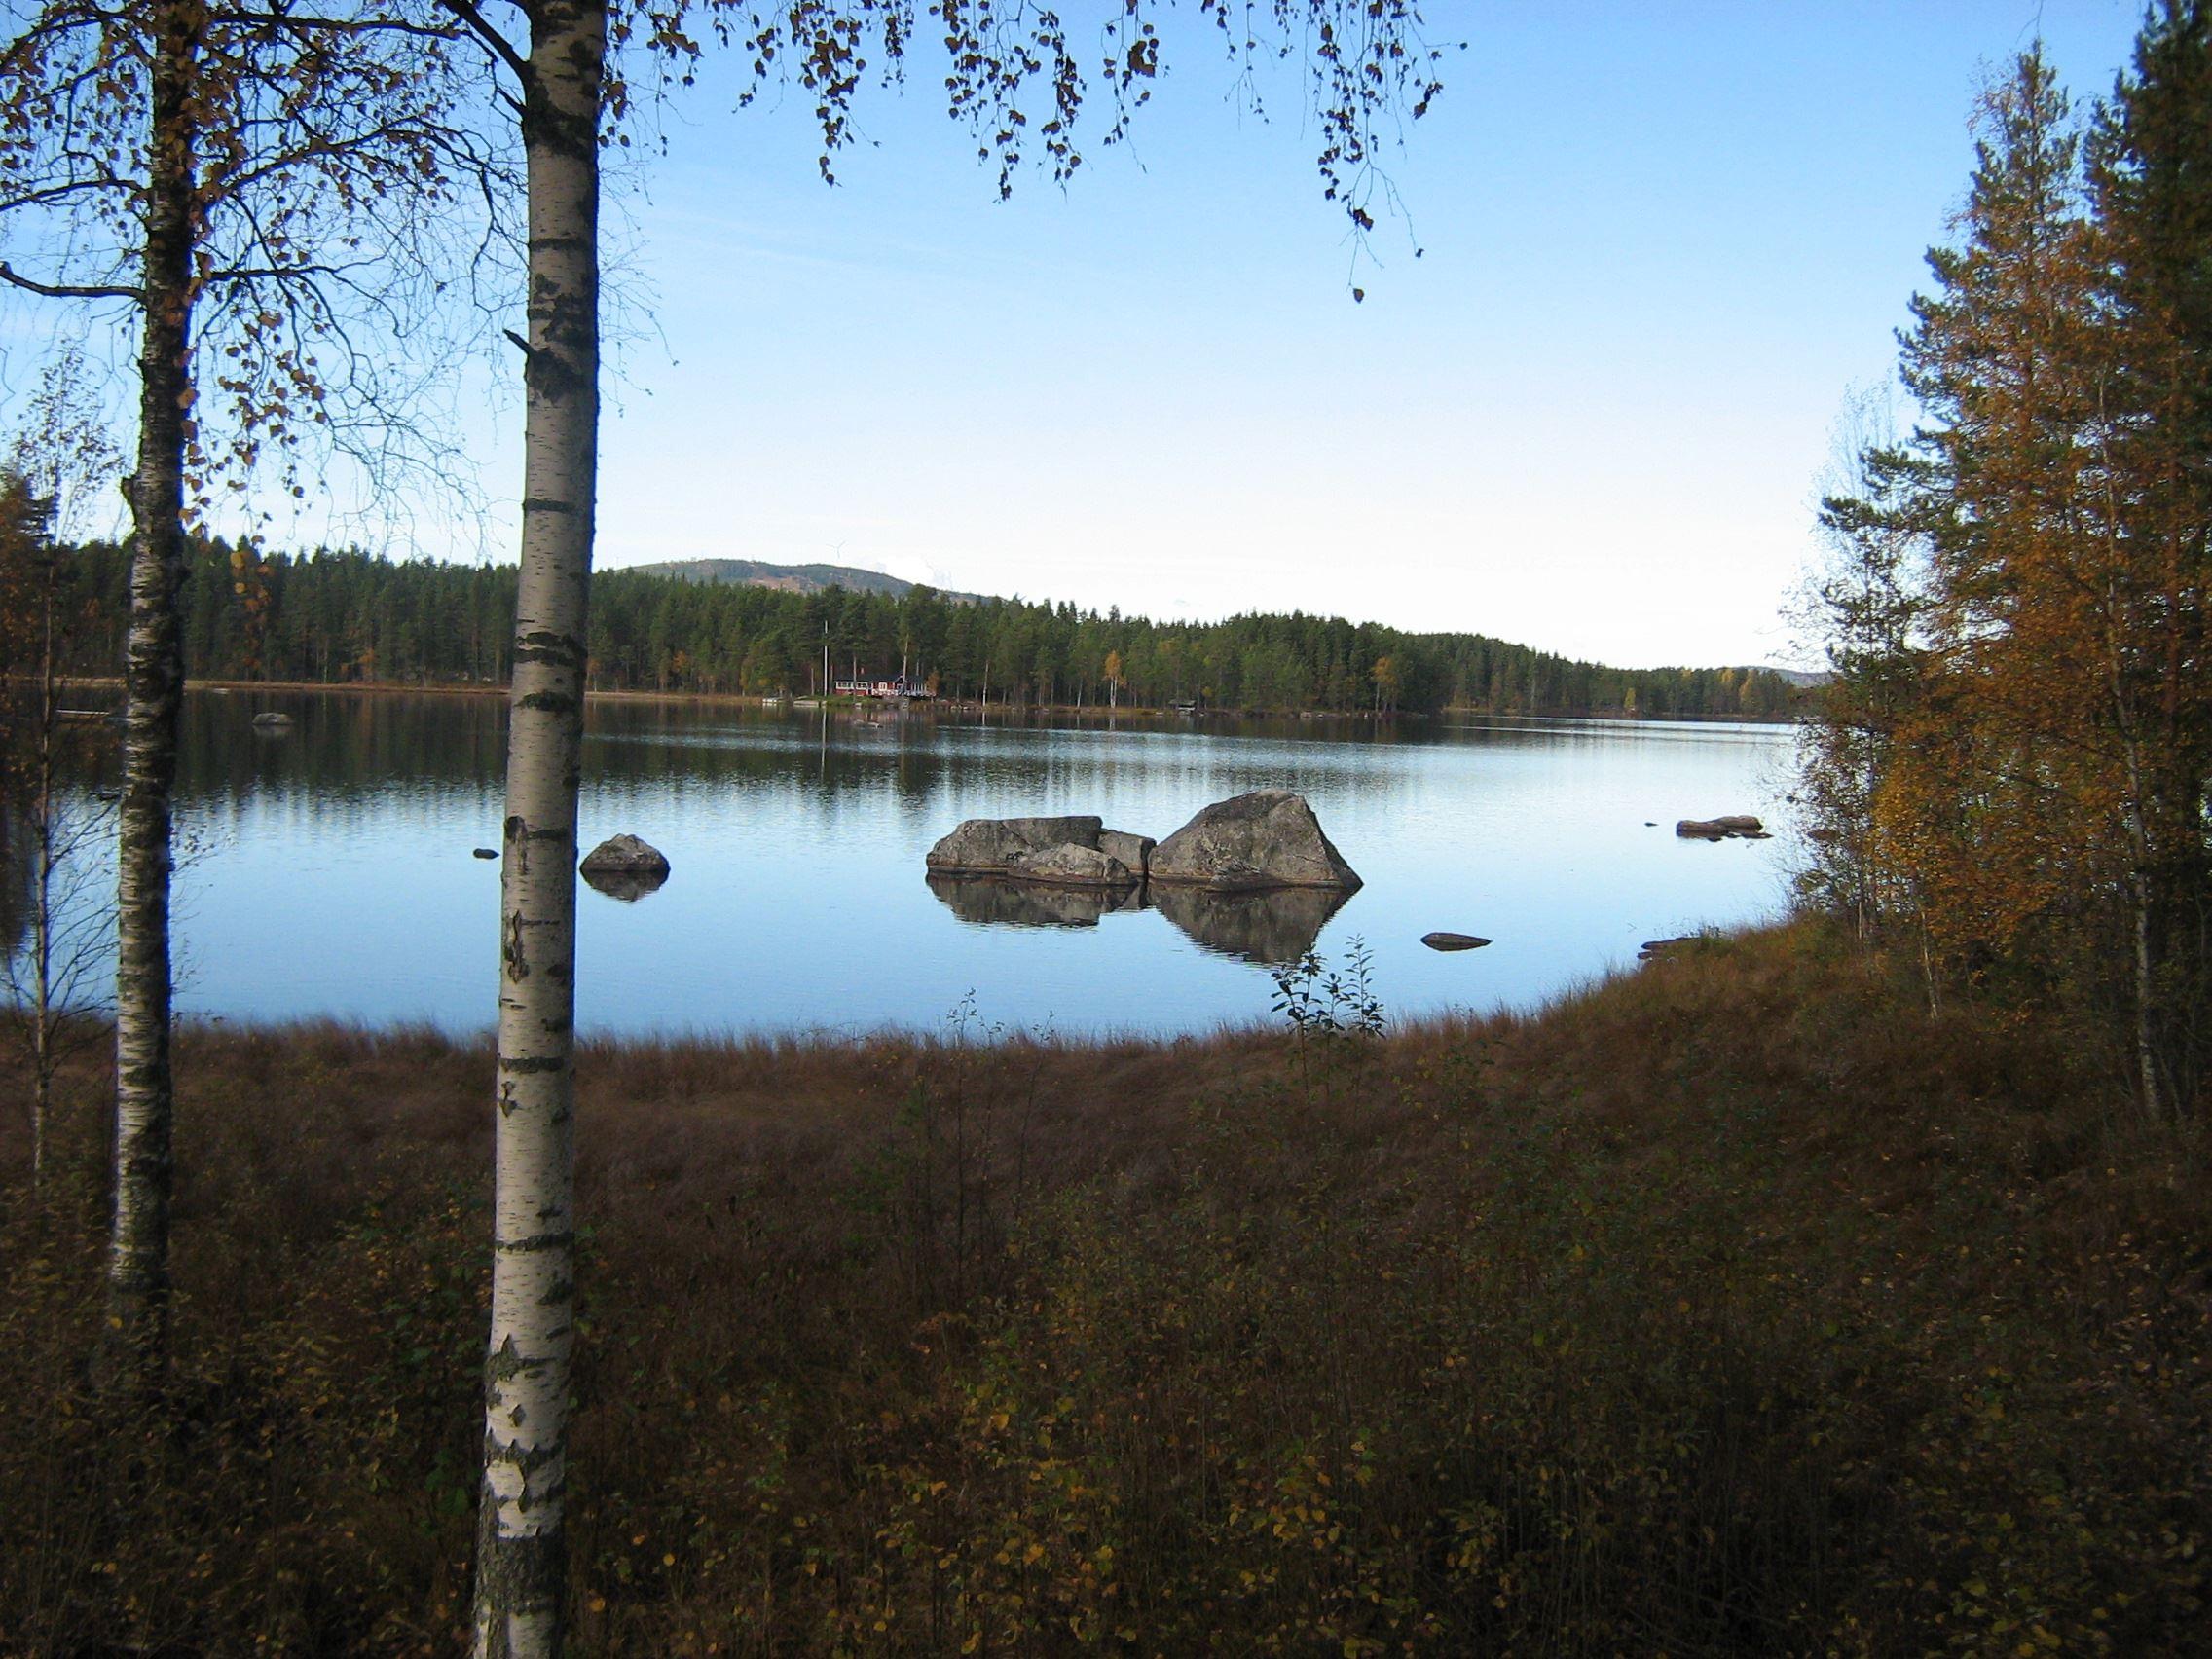 Annika Jonsson, Gransjöbergsleden